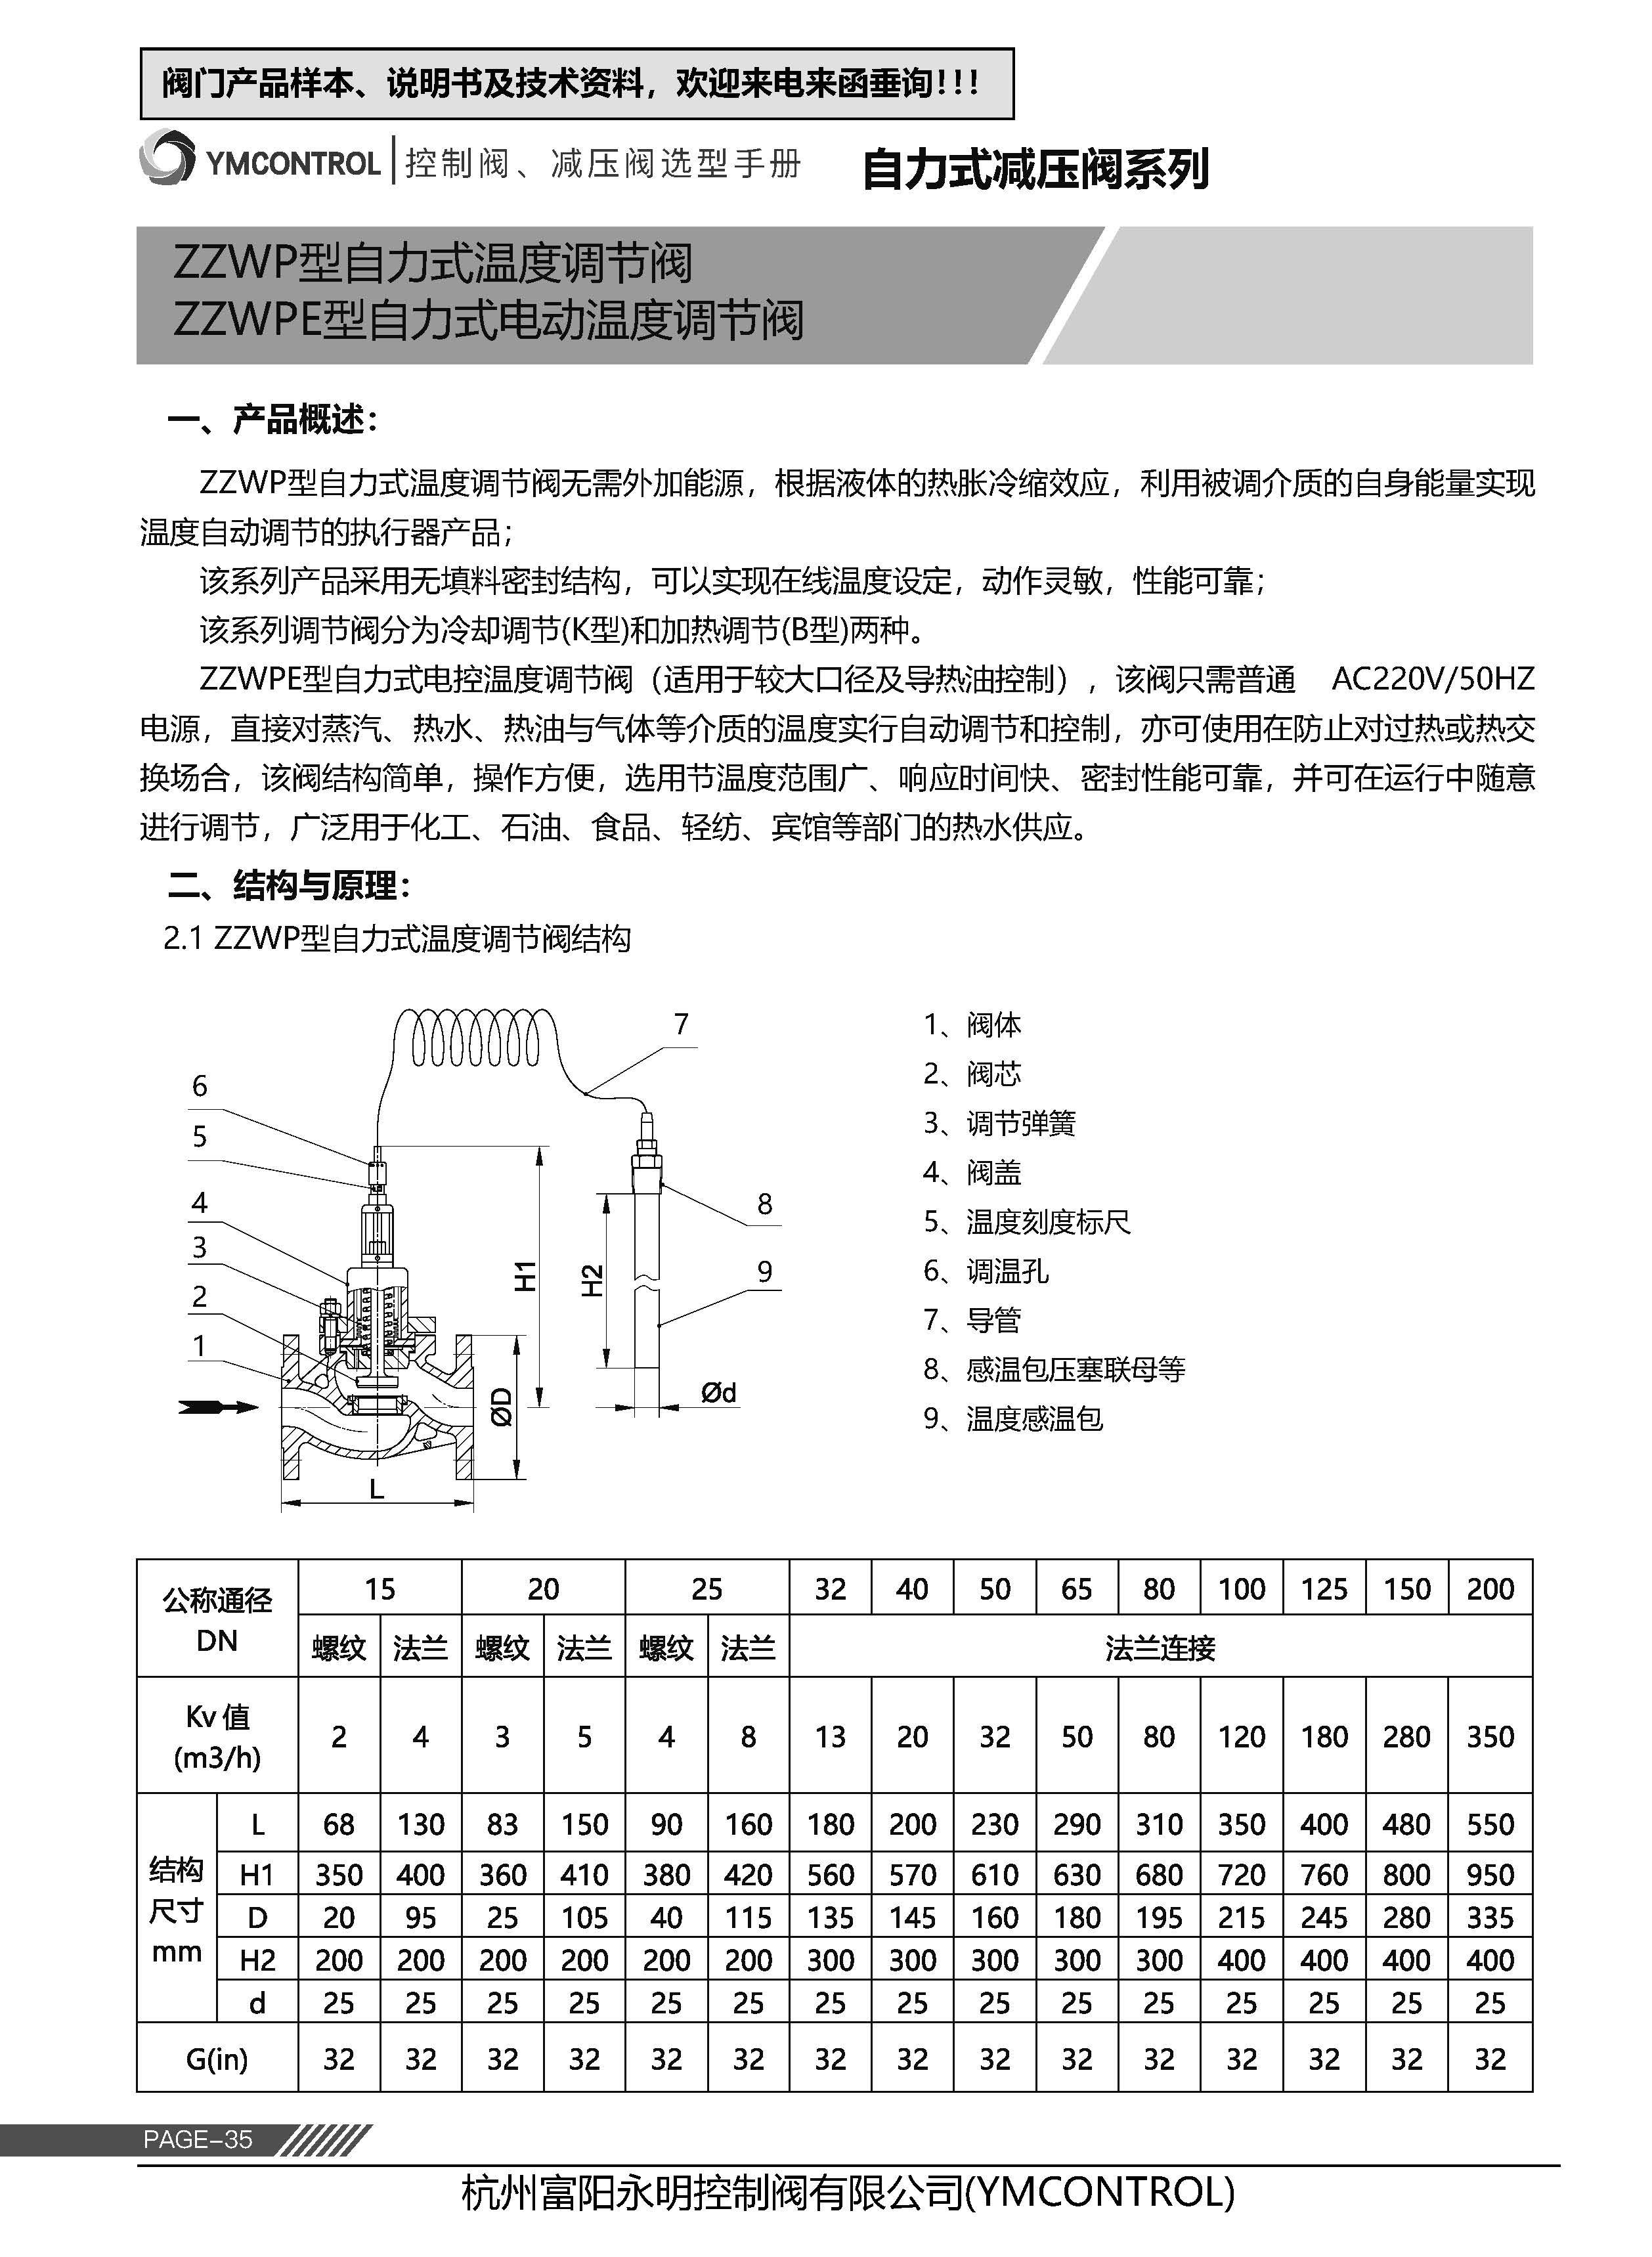 ZDWP-ZZWPE自力式電動溫控閥樣本說明書